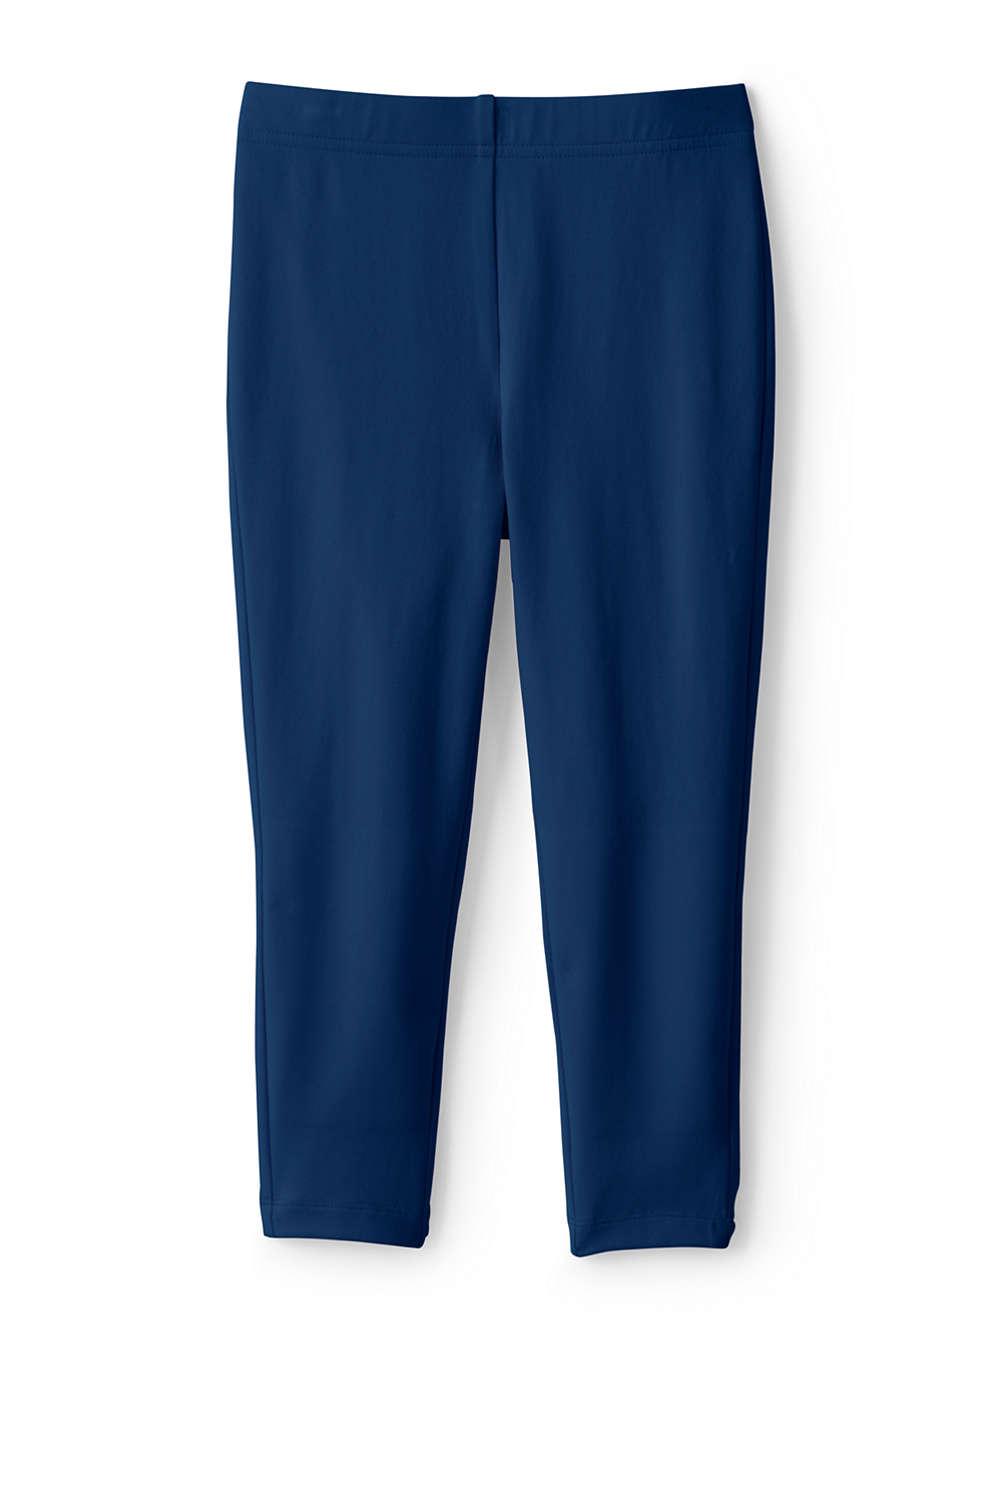 06276e5db9b2e3 School Uniform Girls Iron Knee Capri Solid Leggings from Lands' End